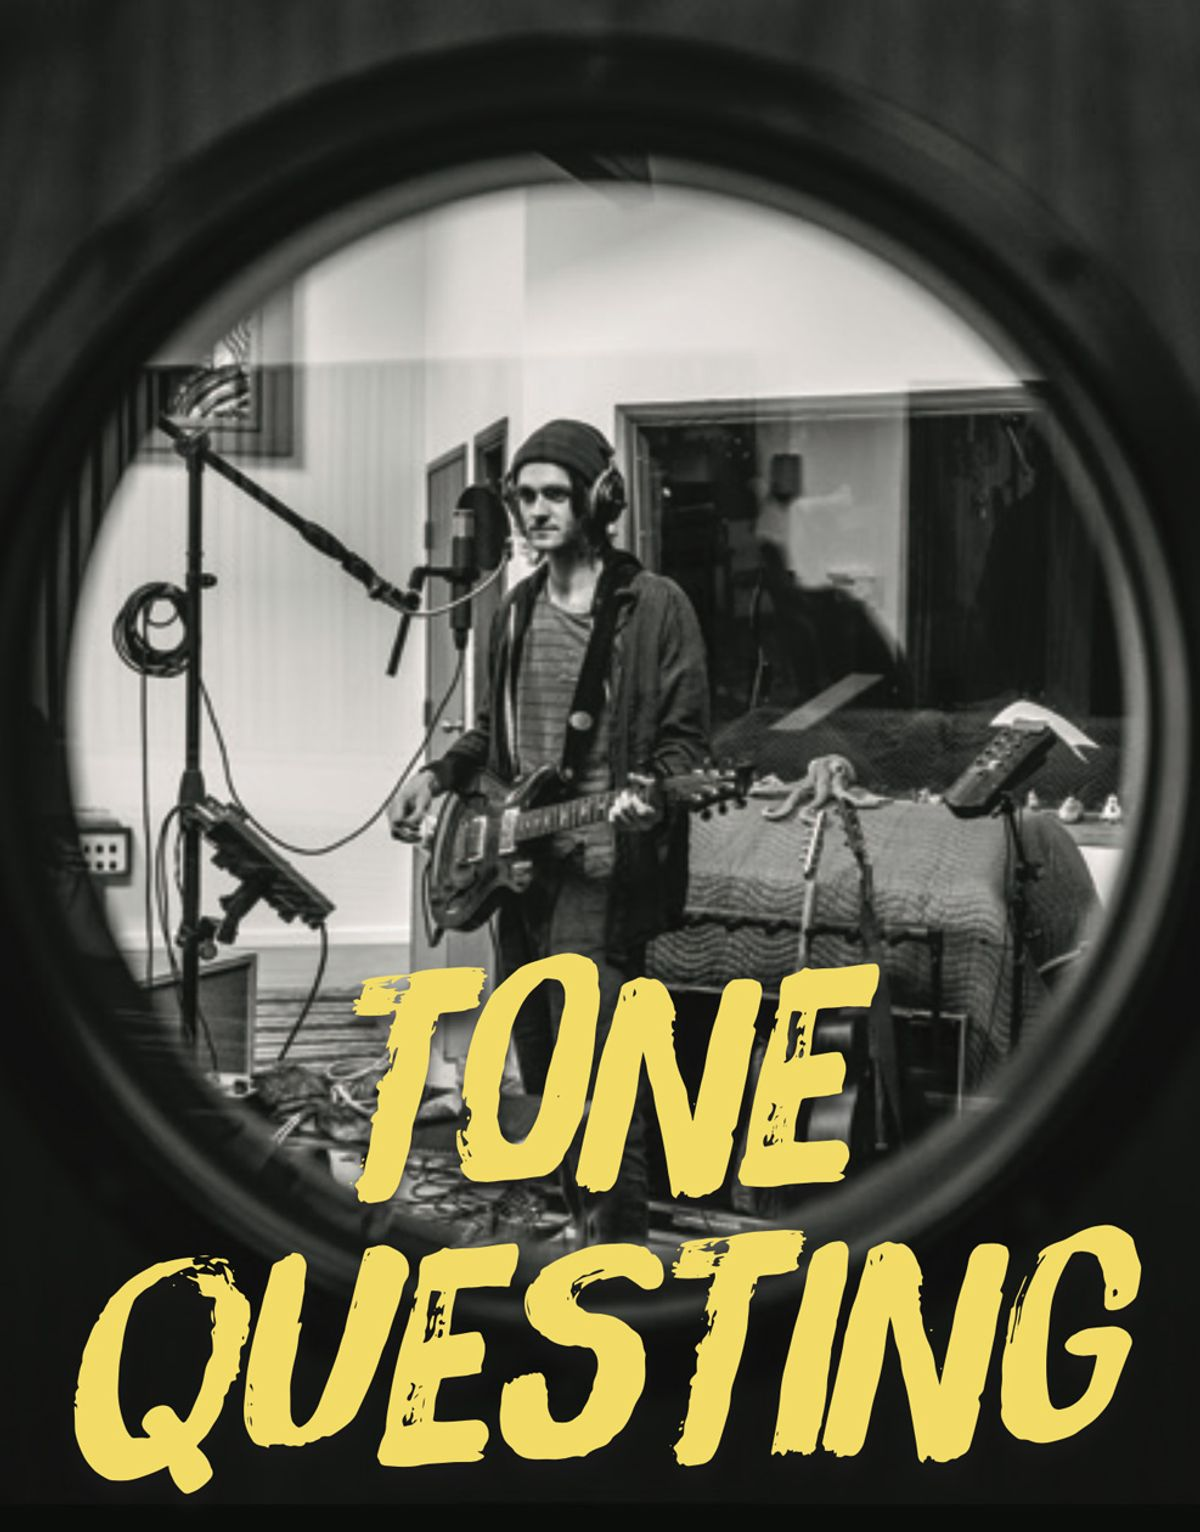 Micah Nelson: Tone Questing